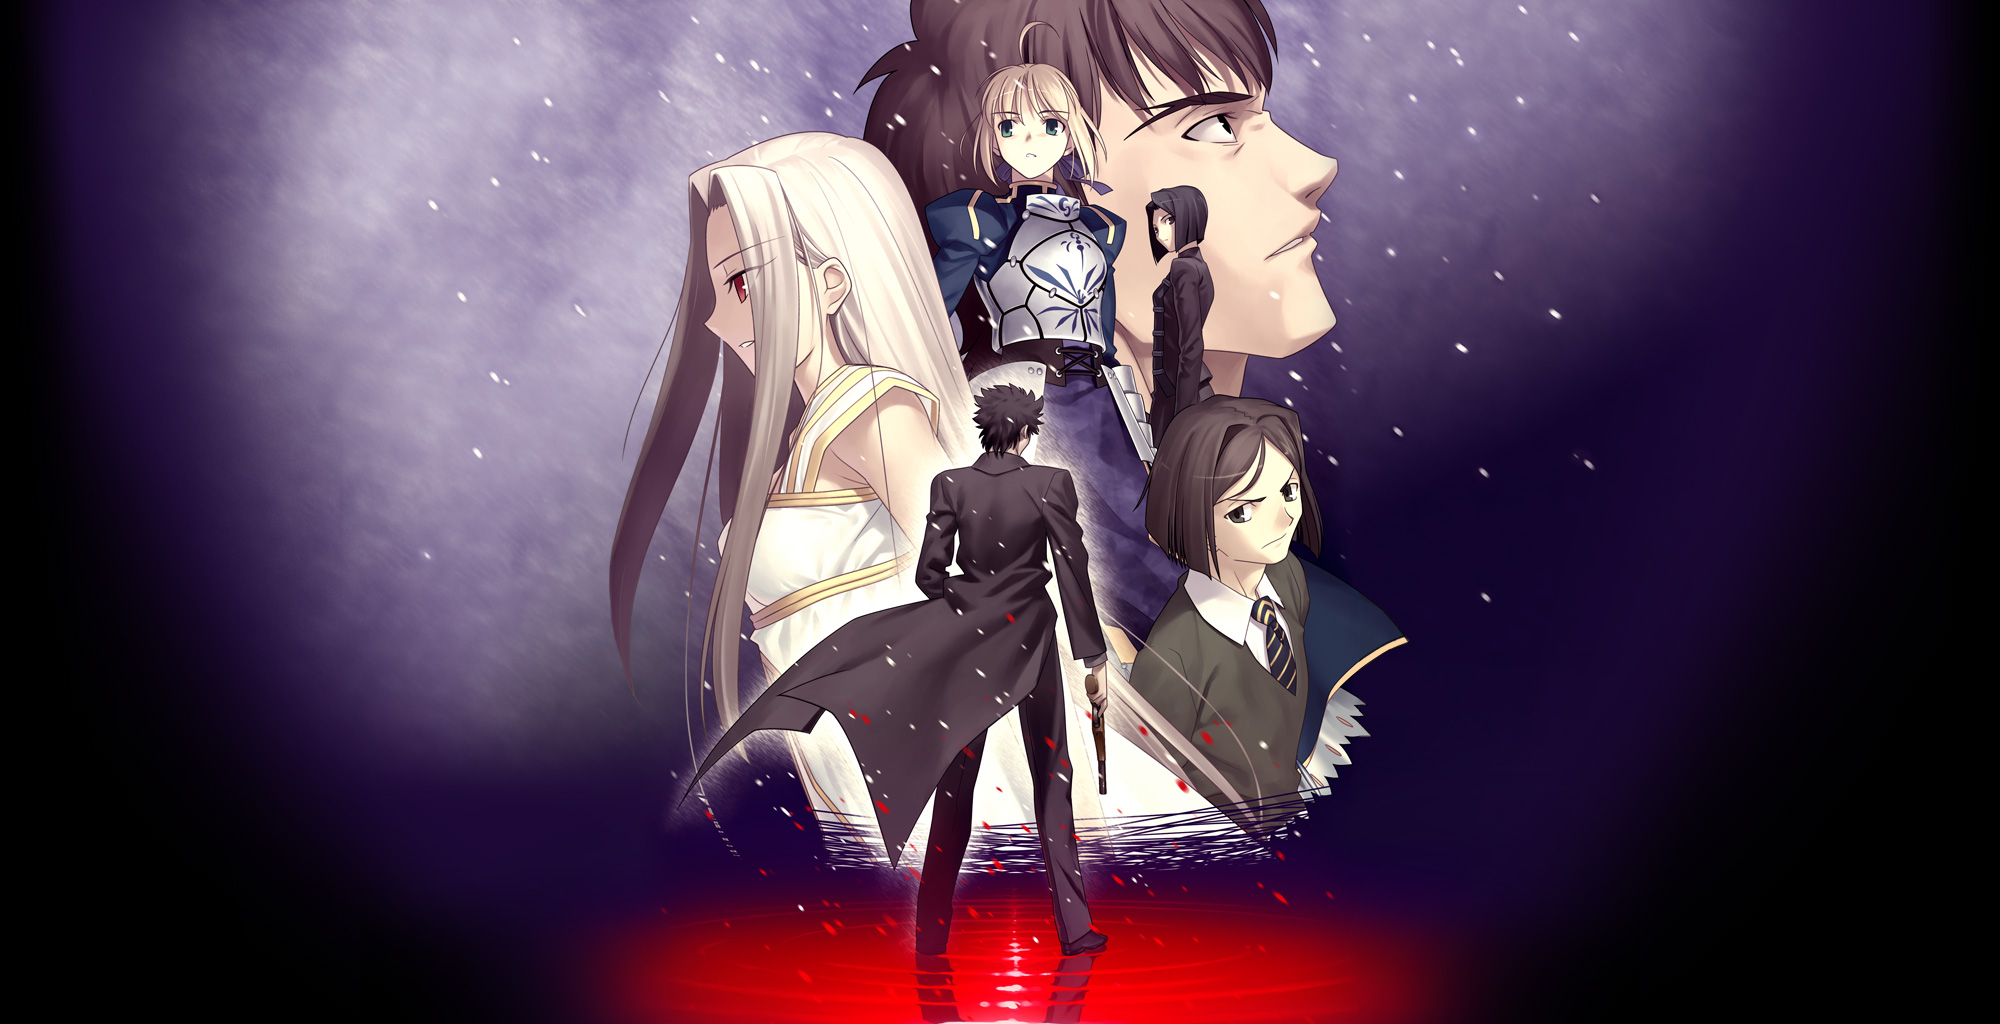 emiya_kiritsugu fate_(series) fate/stay_night fate/zero hisau_maiya irisviel_von_einzbern kotomine_kirei saber tagme waver_velvet